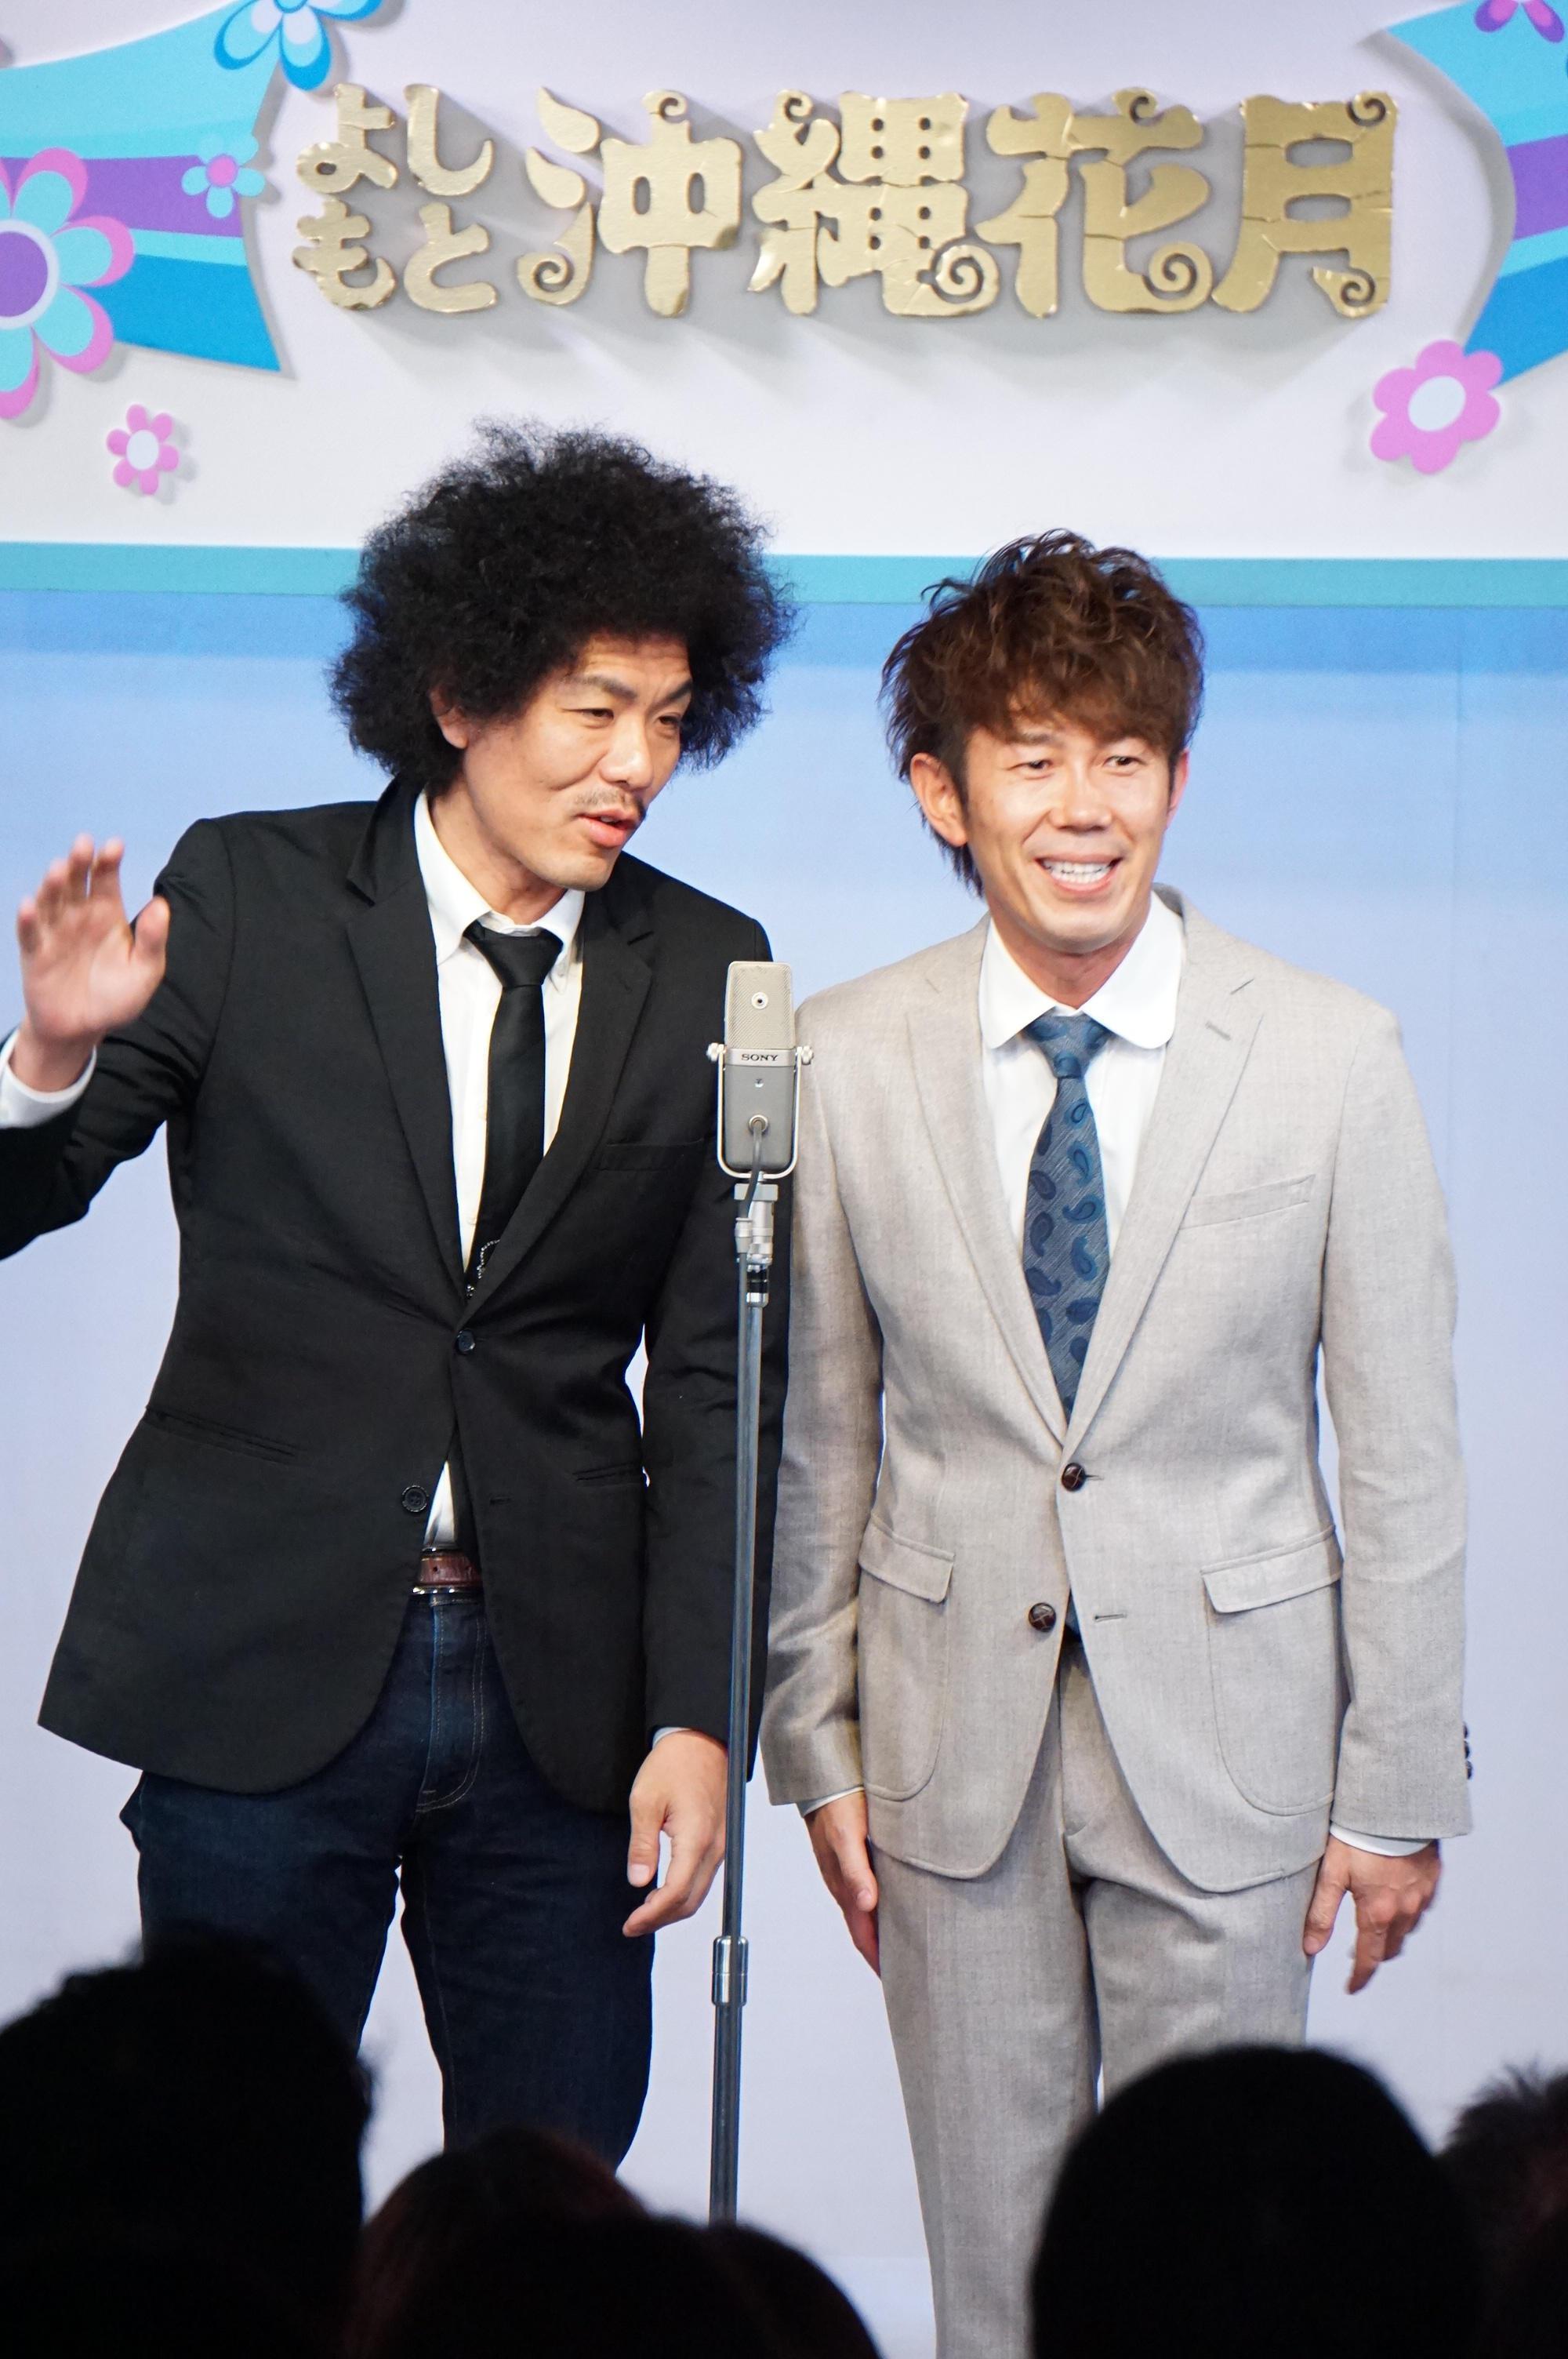 http://news.yoshimoto.co.jp/20170314201657-dbe721924f6feb36f45f68d754a6d01180ea9a76.jpg